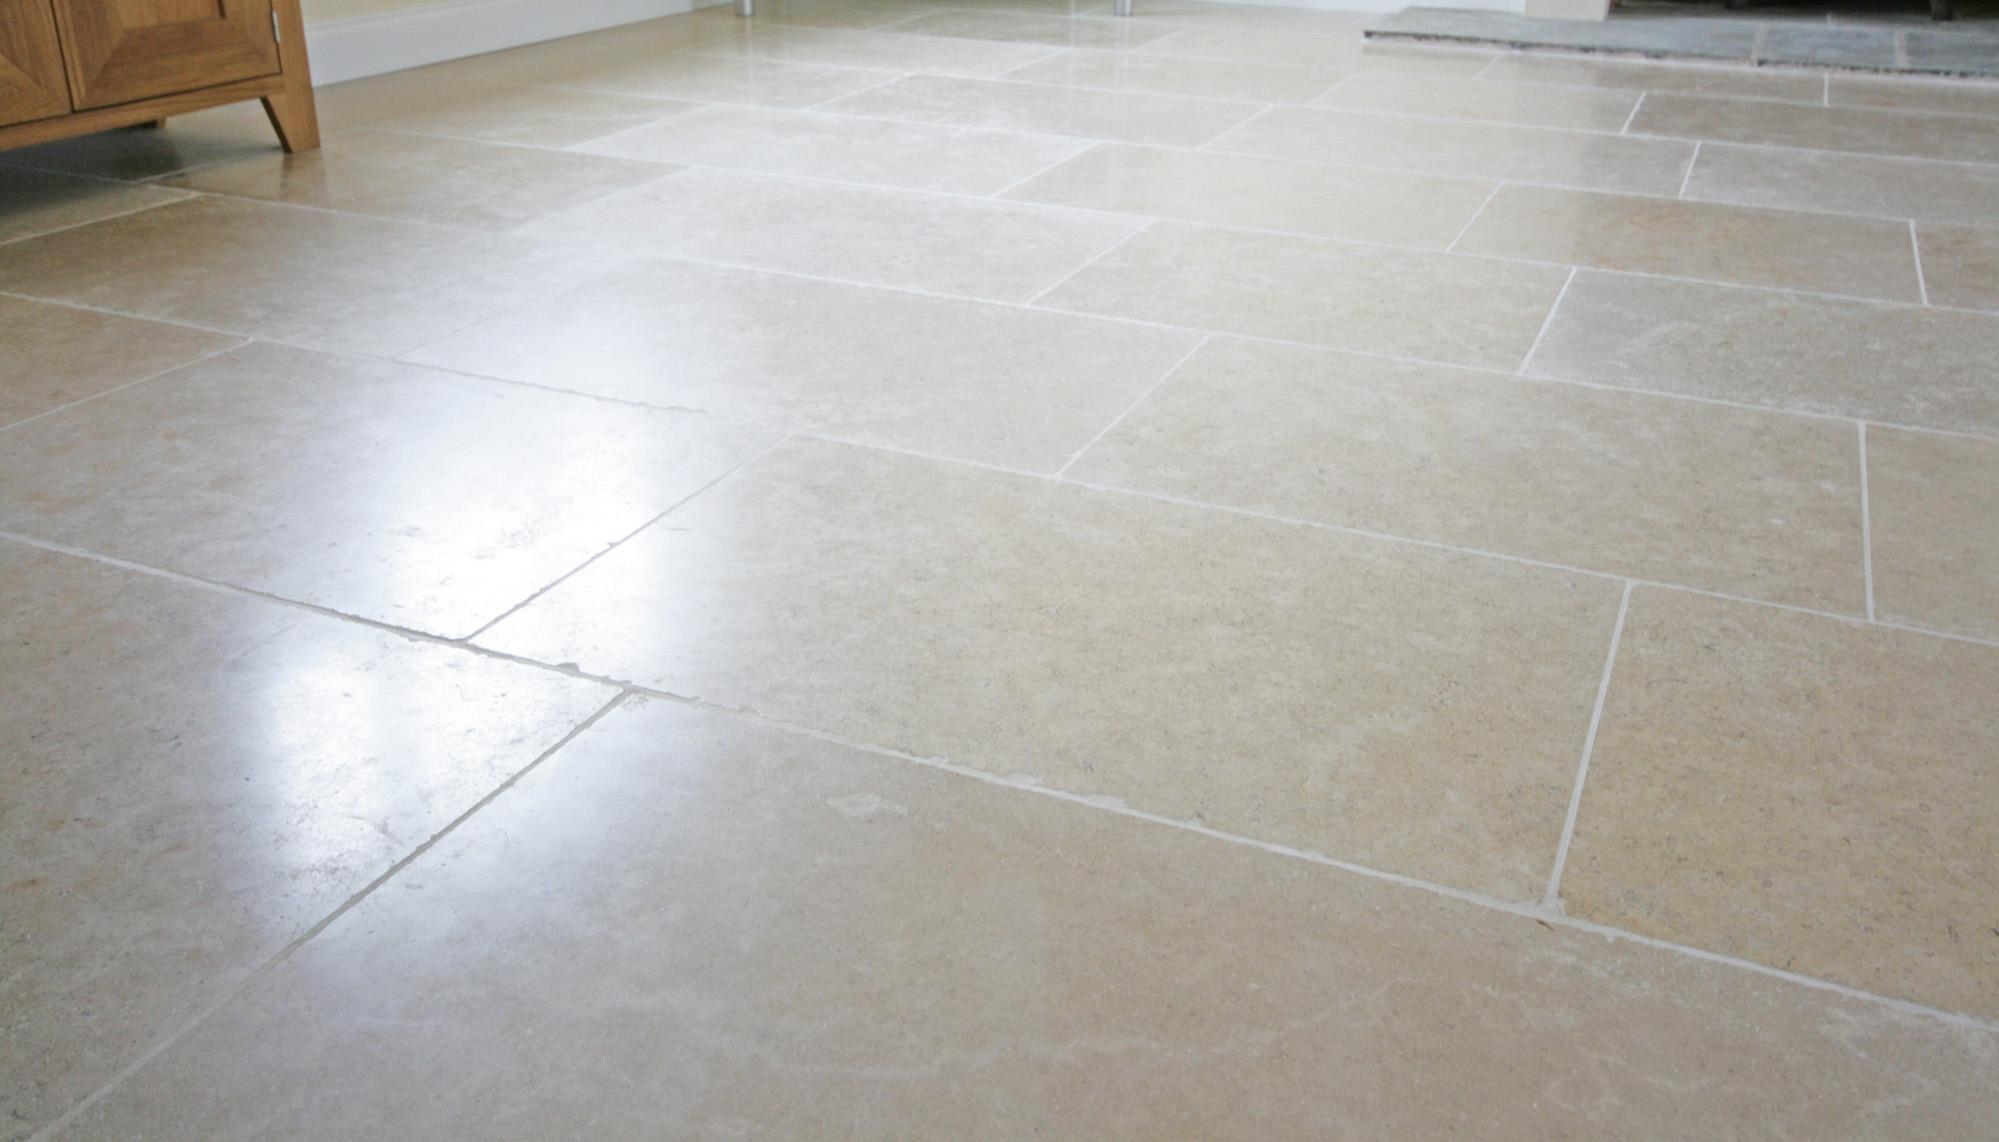 Abbey carpets flooring tewkesbury carpet vidalondon for House floor tiles sample pictures